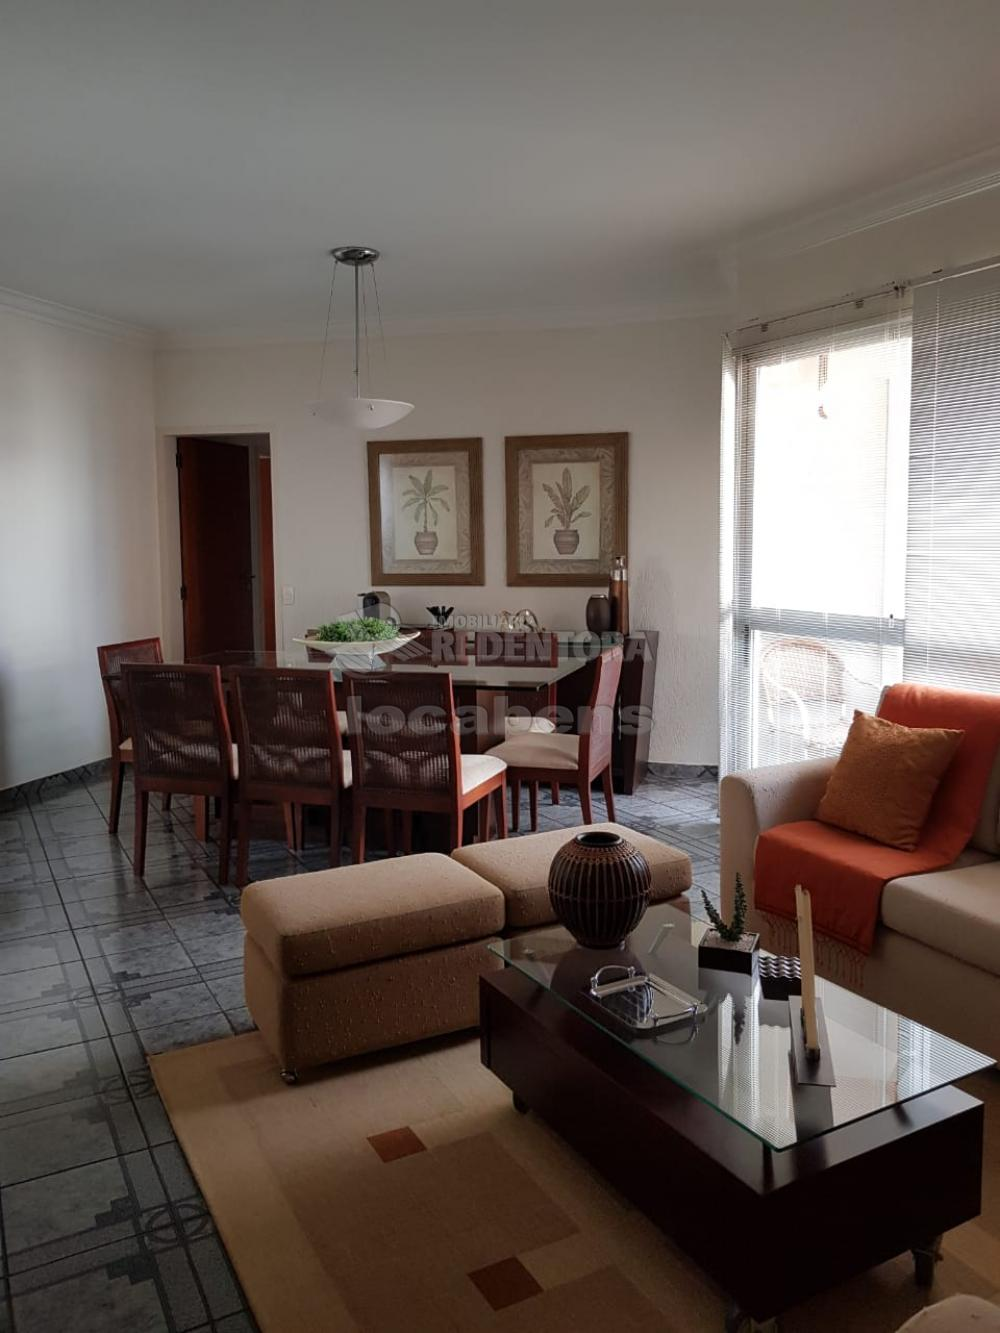 Sao Jose do Rio Preto Apartamento Venda R$730.000,00 Condominio R$800,00 4 Dormitorios 1 Suite Area construida 150.00m2